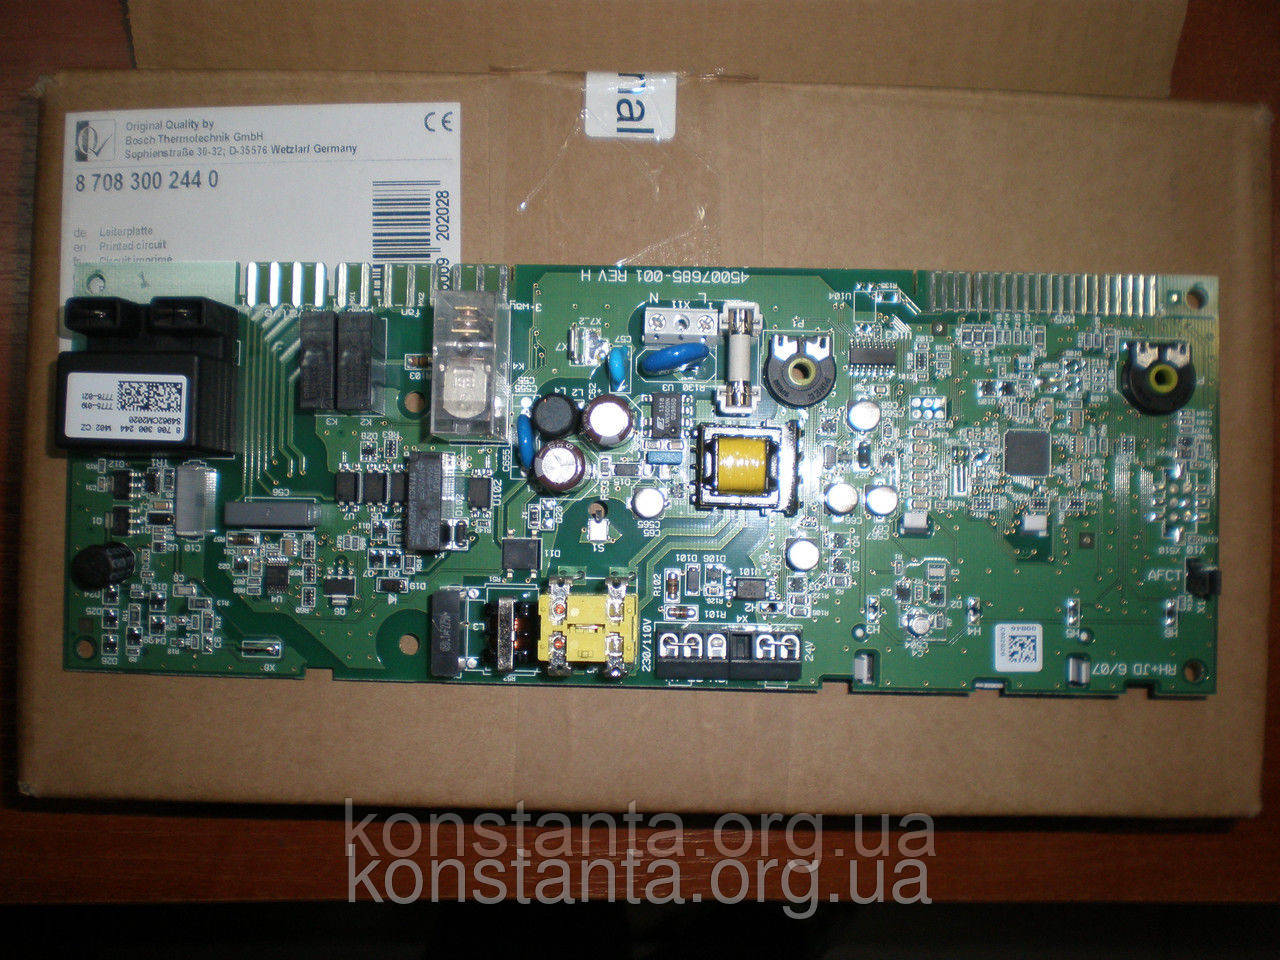 Плата управления для Junkers-Bosch ZW24-2DH KE/AE - Интернет-магазин KONSTANTA в Харькове